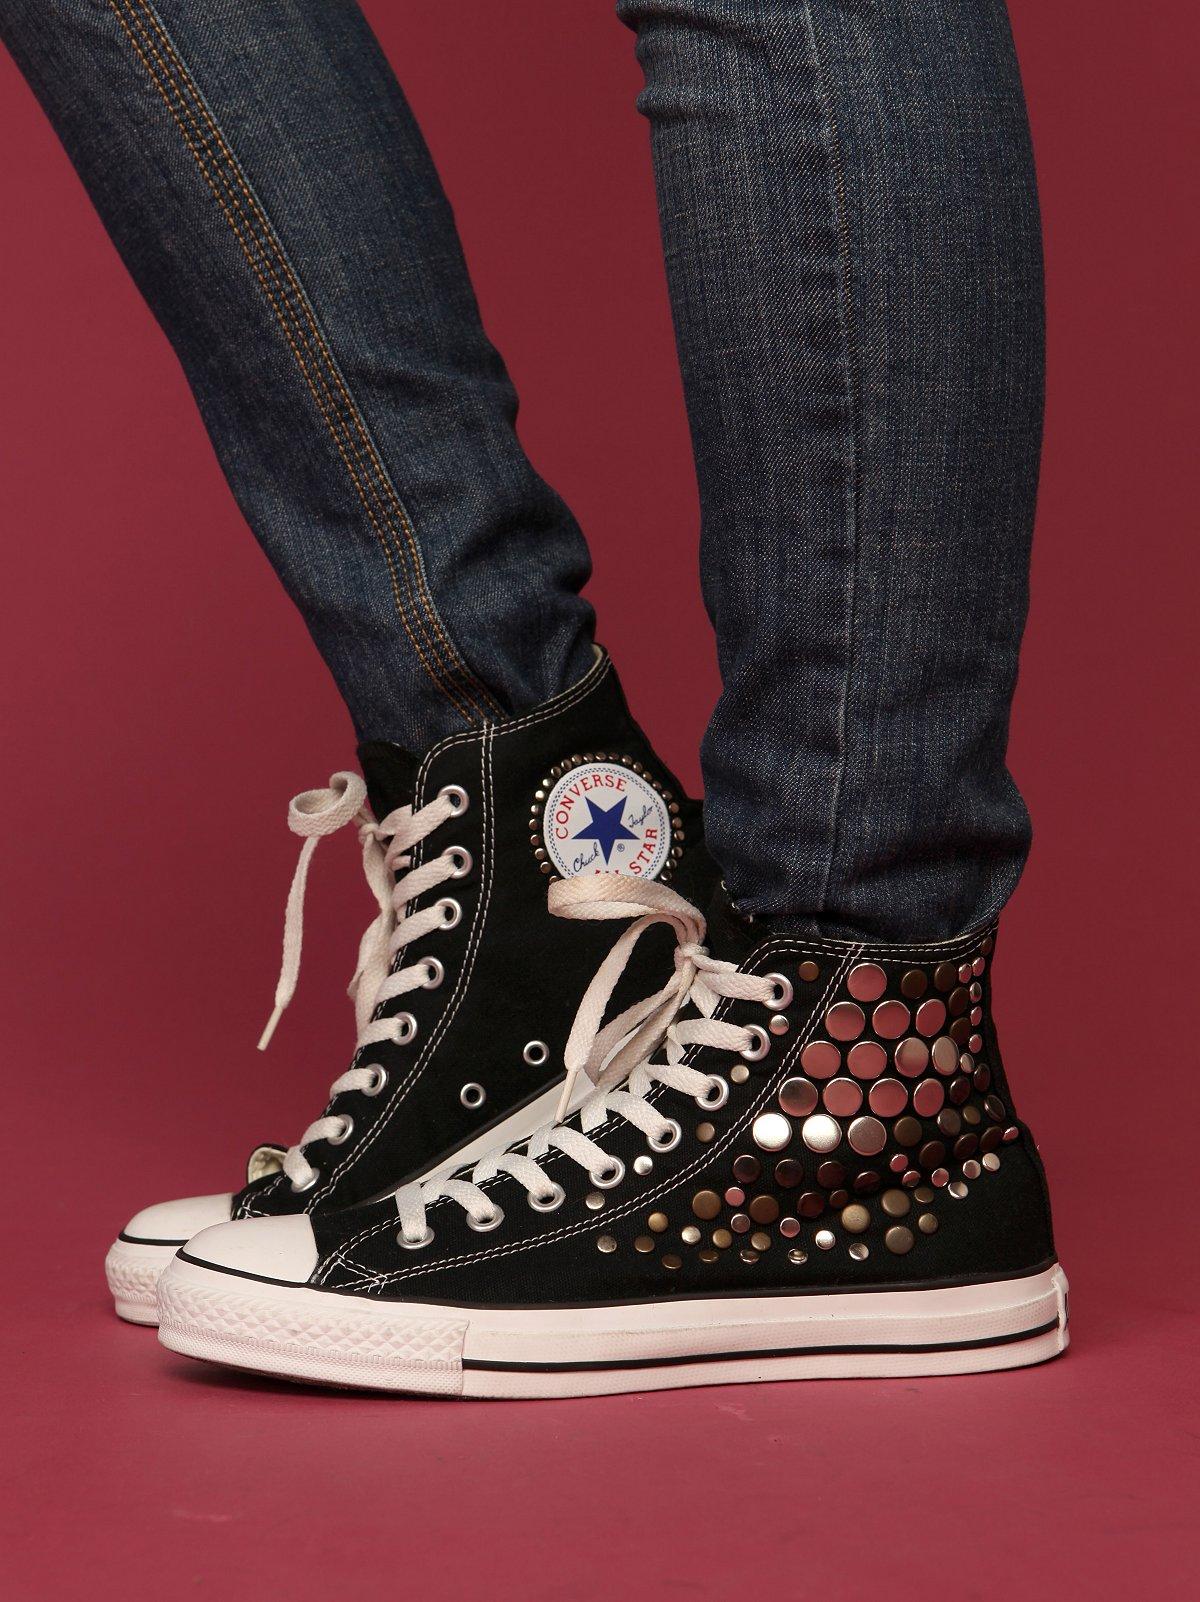 Grommet Converse